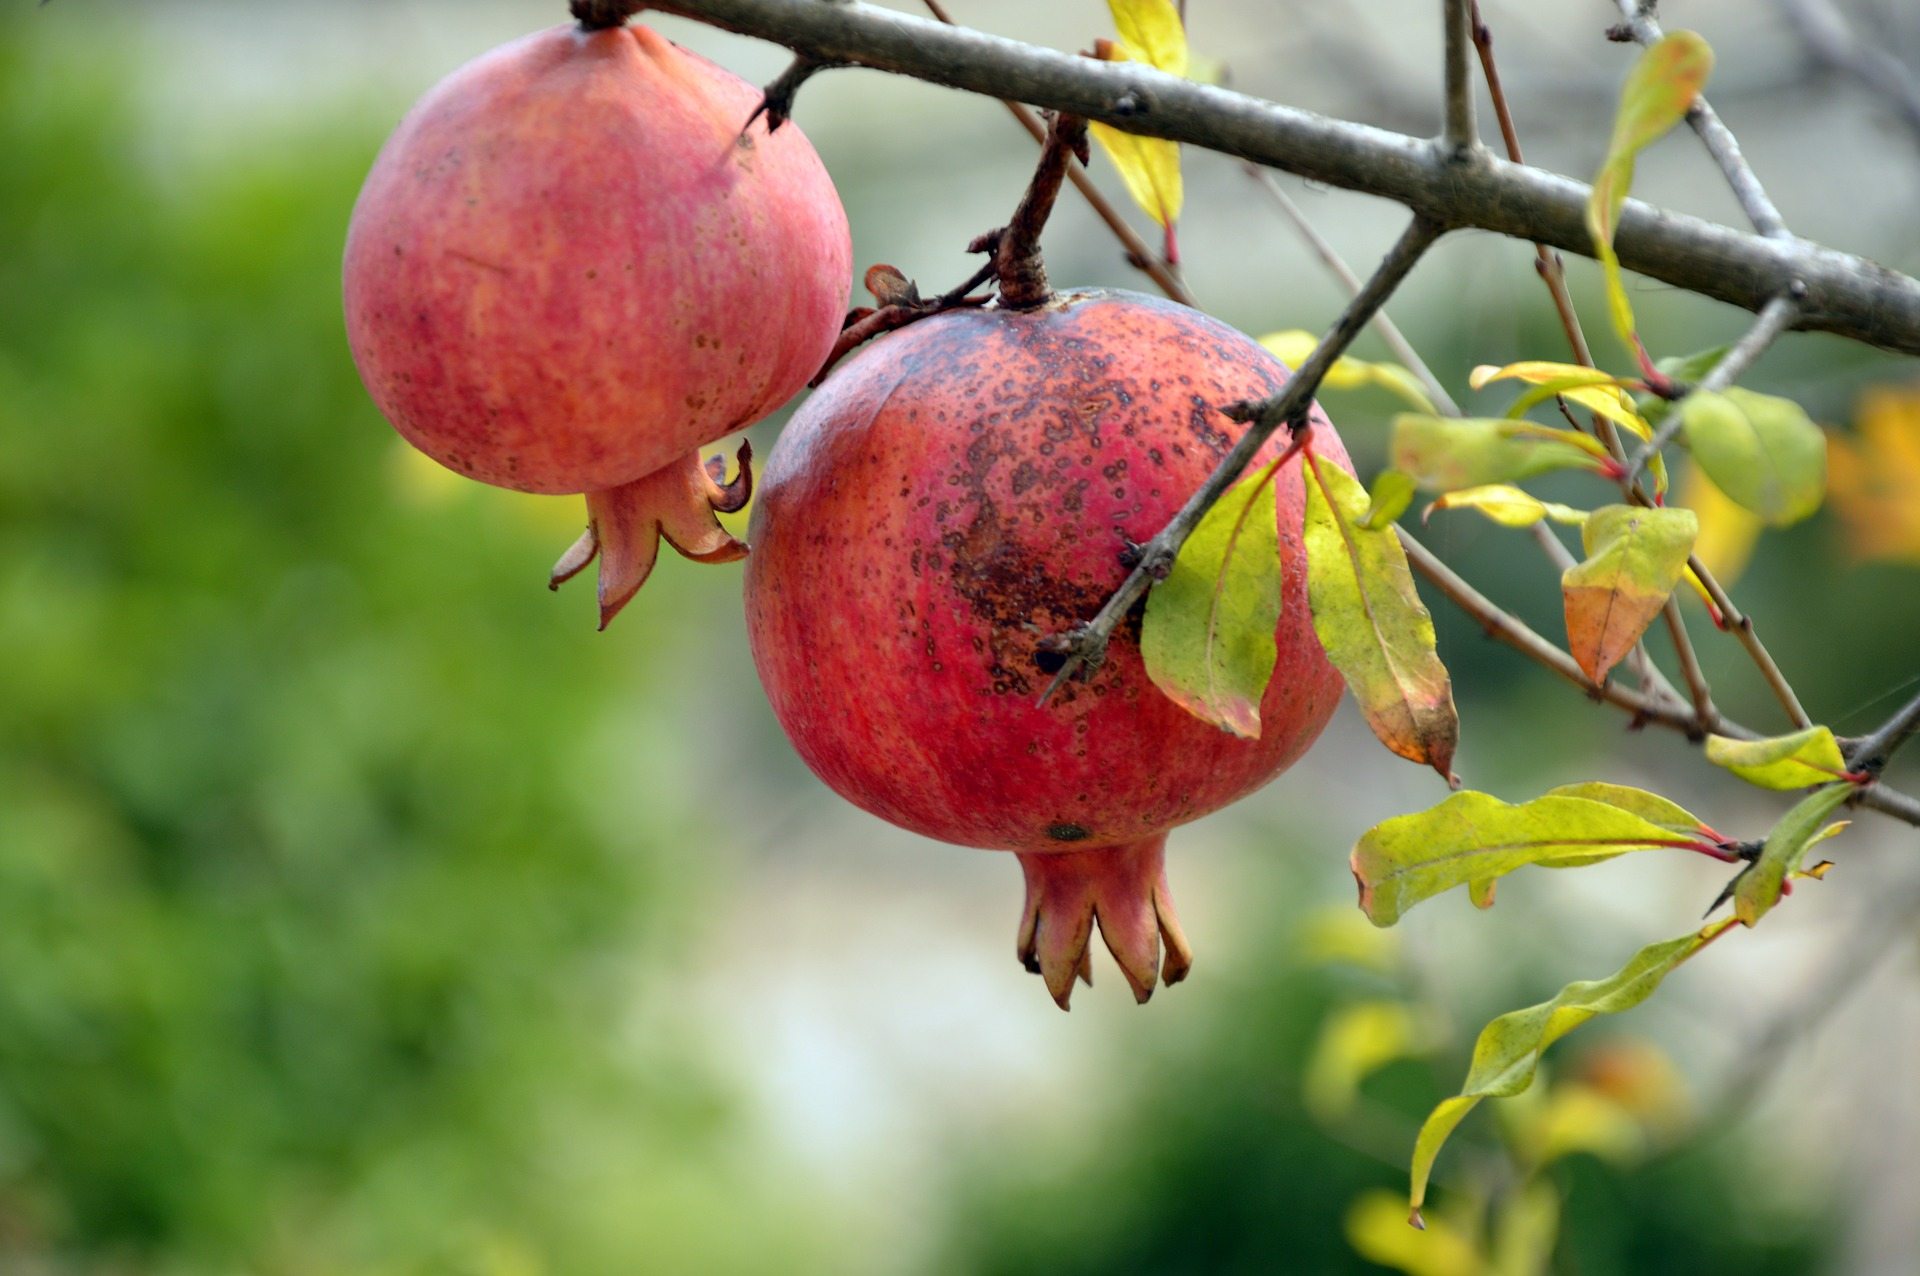 http://m.wm.pl/2020/07/orig/pomegranate-3752112-1920-638364.jpg